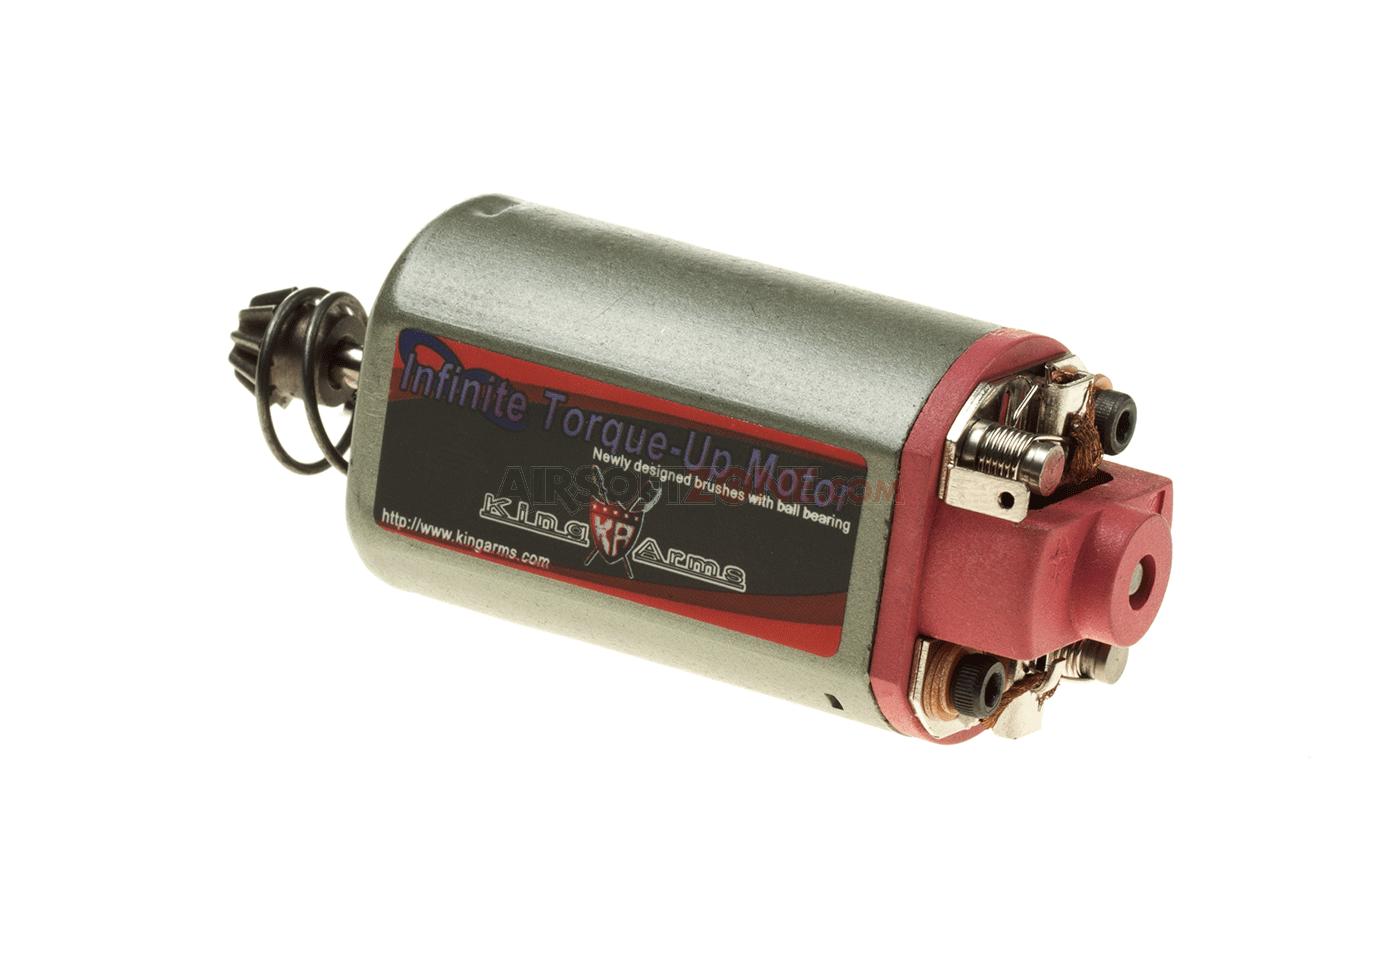 Infinite Torque Up Motor Short King Arms Motoren